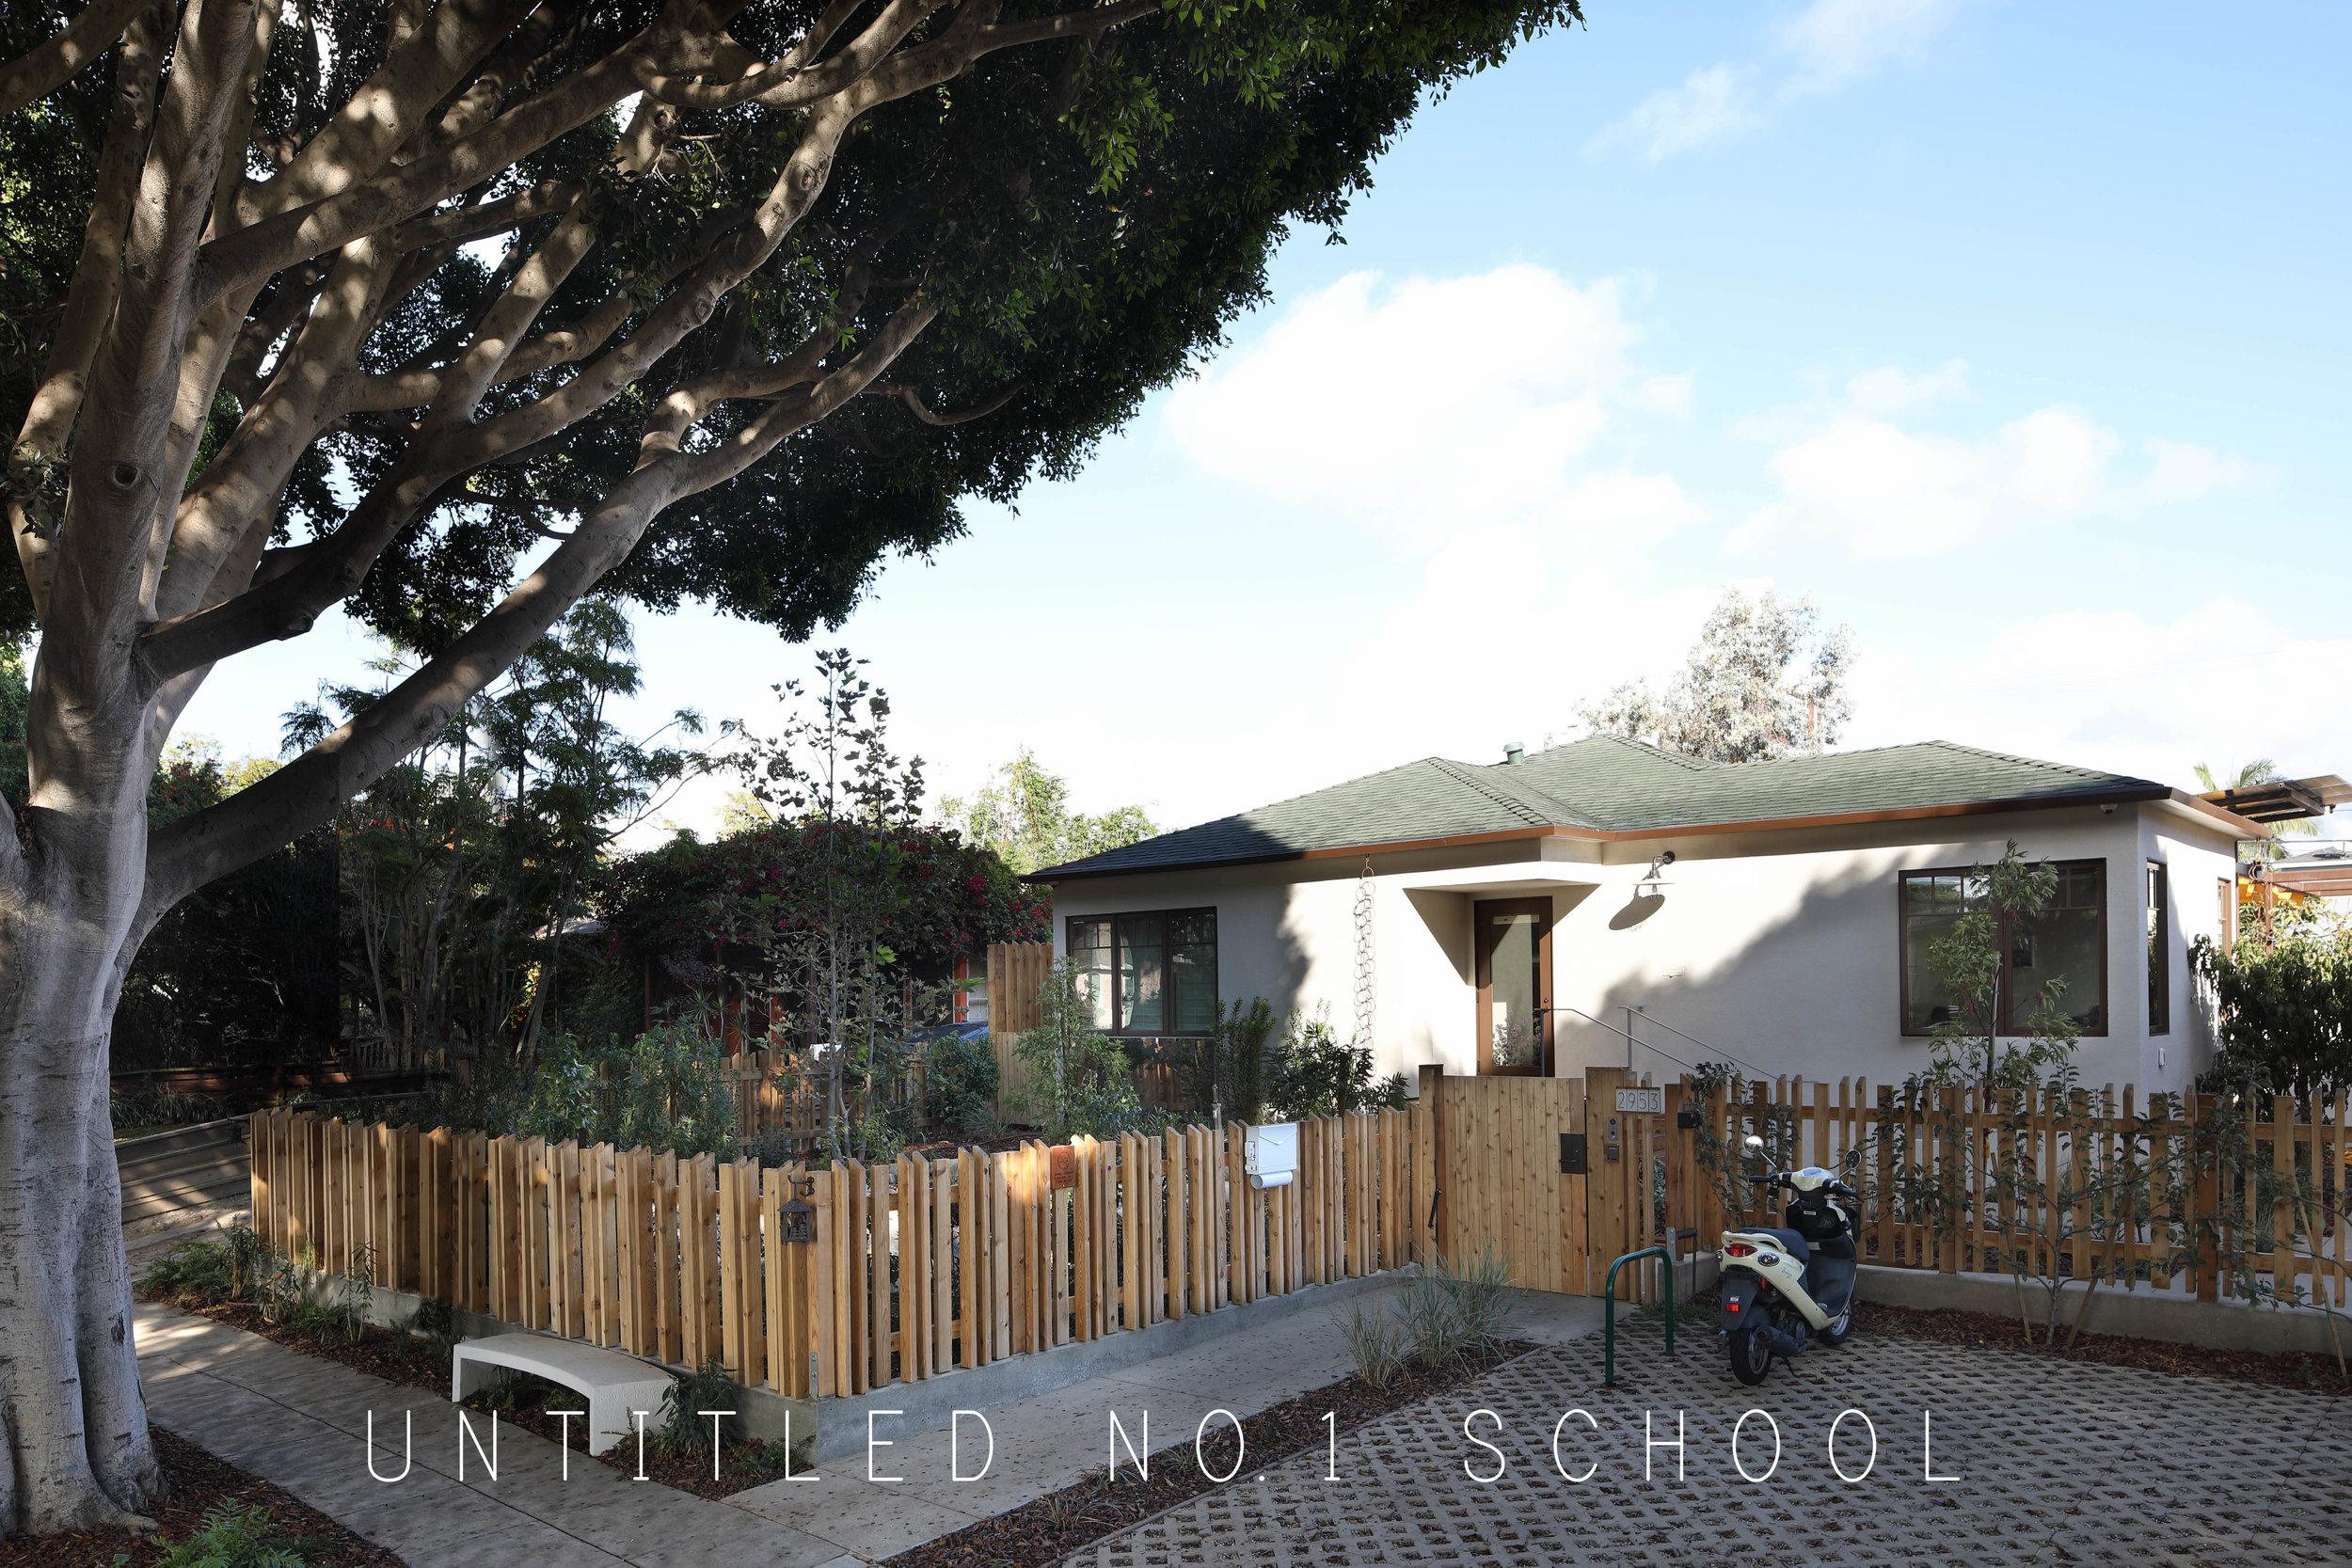 Untitled No. 1 School, Santa Monica, CA